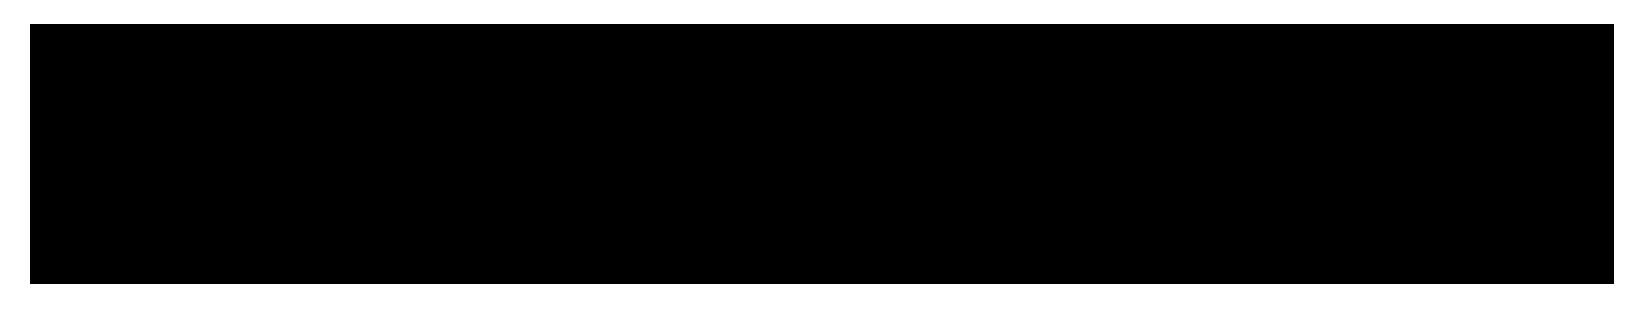 Lenceria Tallas Grandes Ropa Interior Ropa Interior Mujer Lenceria